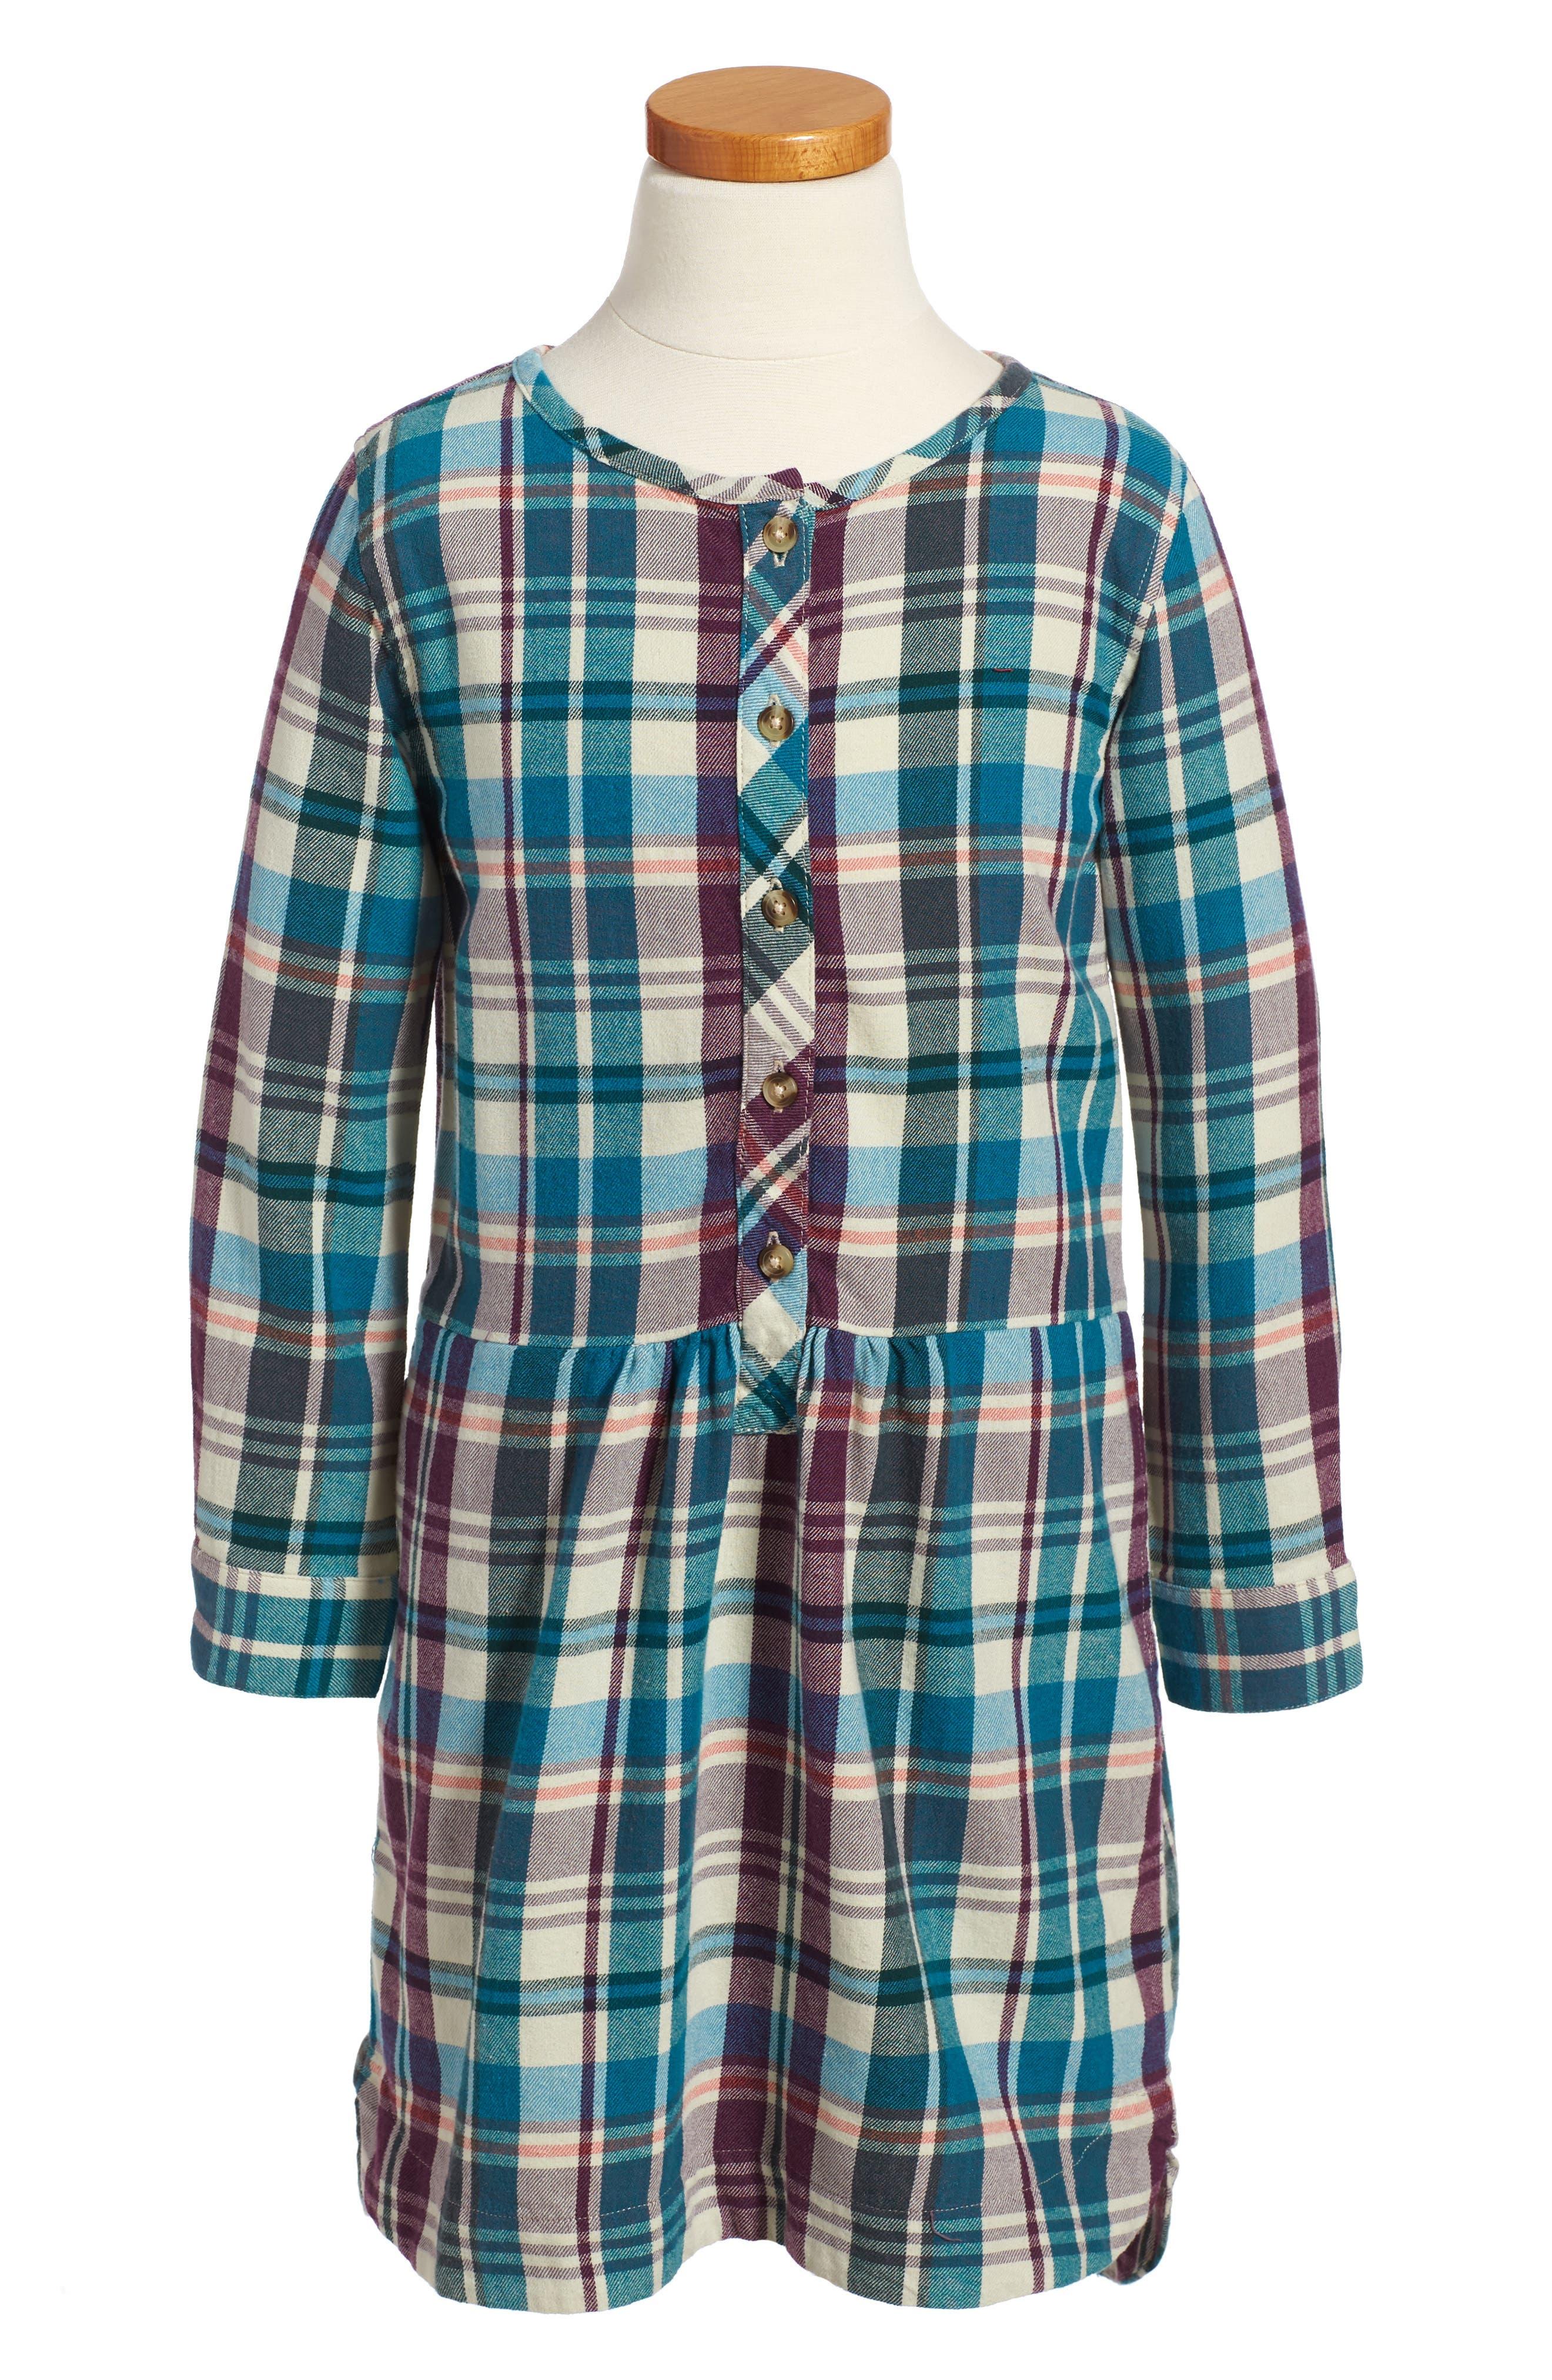 Alternate Image 1 Selected - Tea Collection Applecross Plaid Flannel Shirtdress (Toddler Girls, Little Girls & Big Girls)